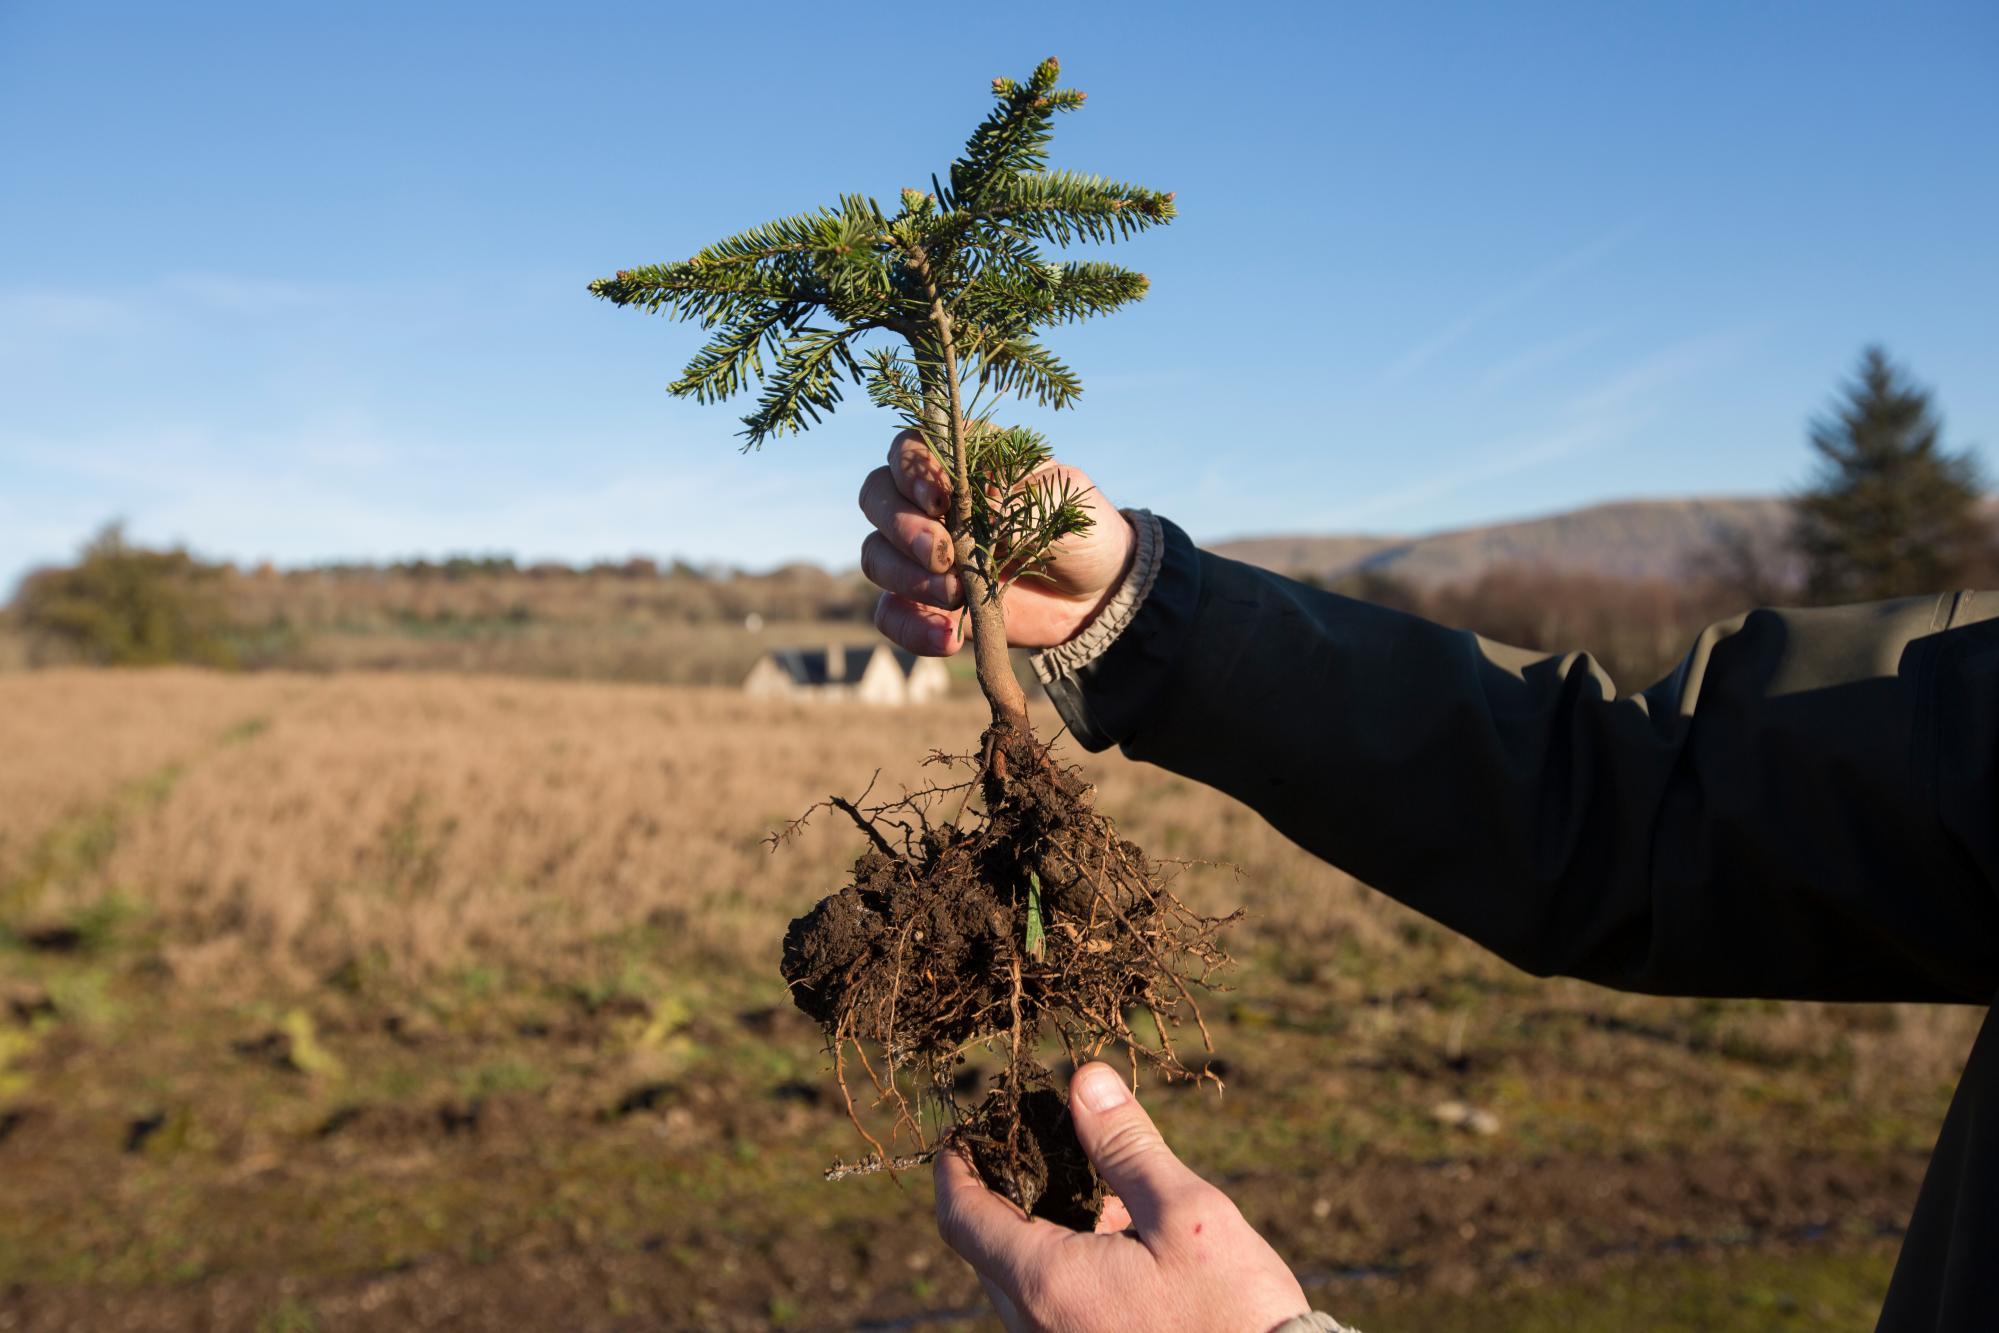 Planting a Real Christmas Tree